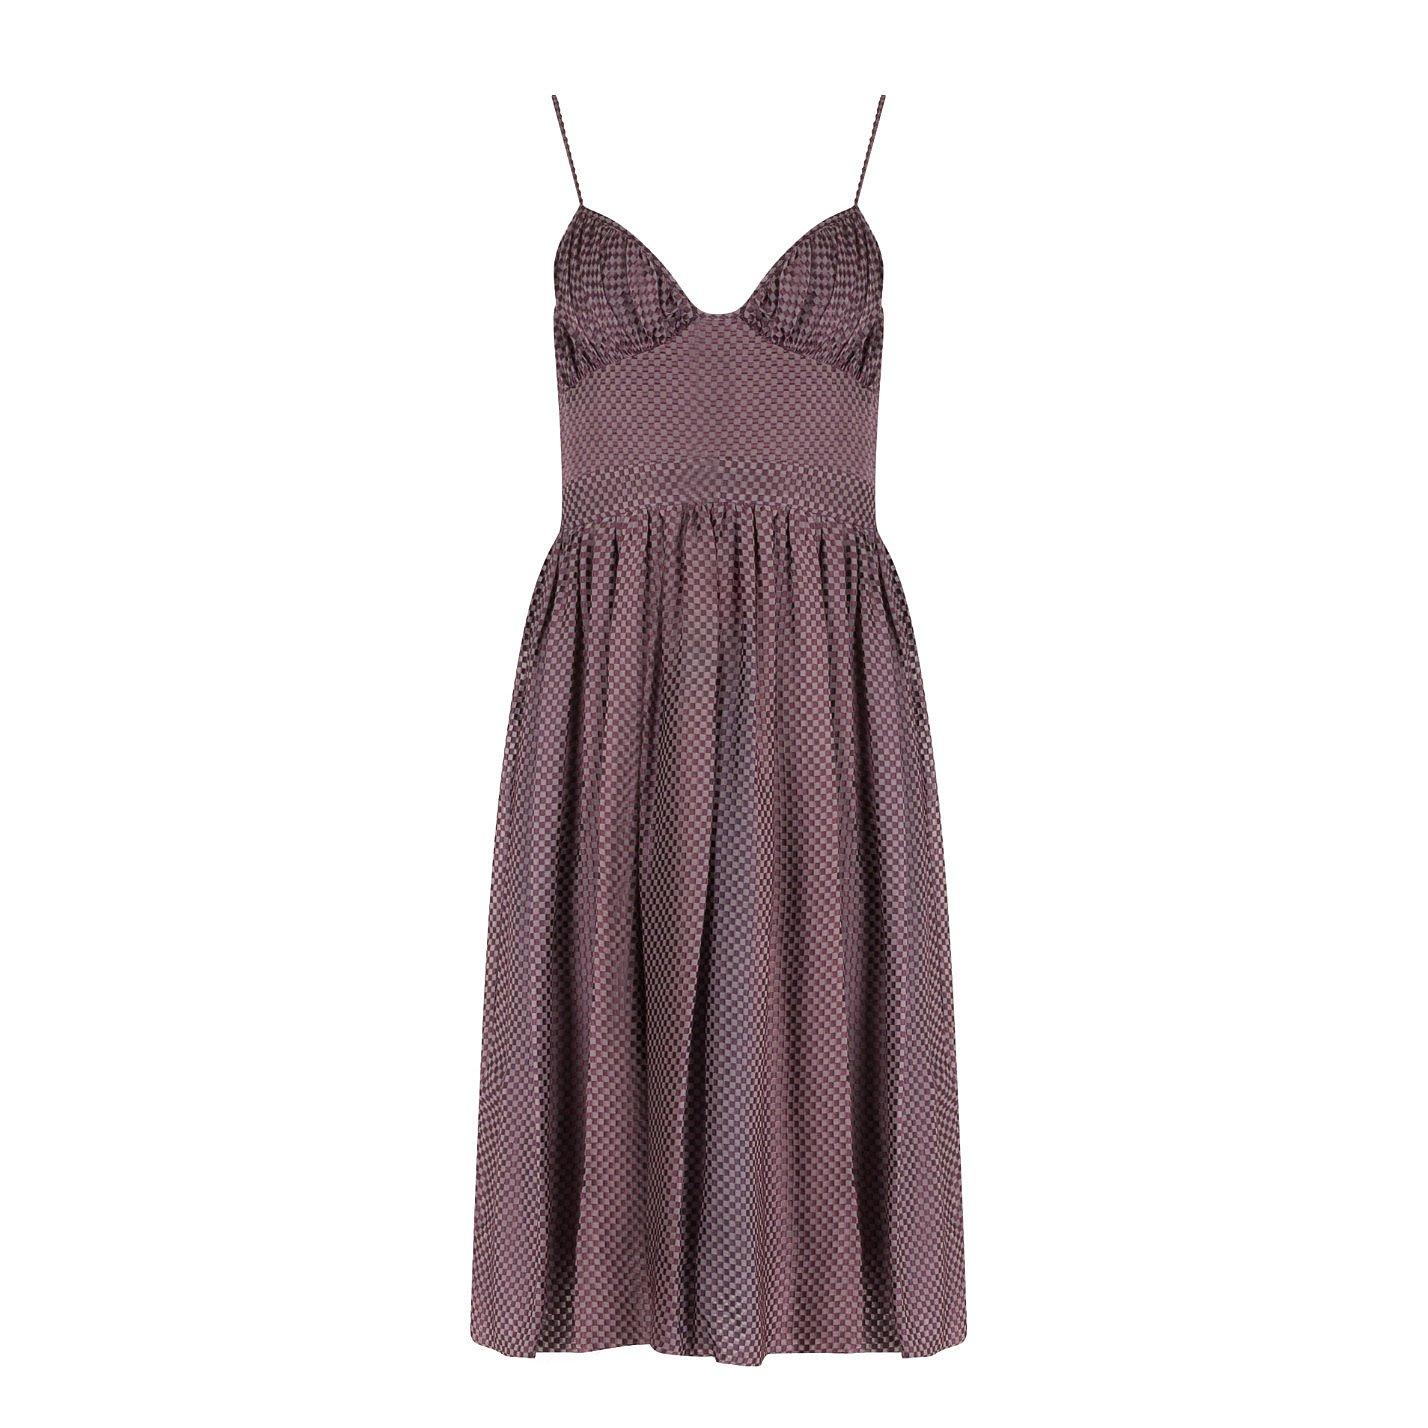 CAMILLA AND MARC Velvet Check Dress